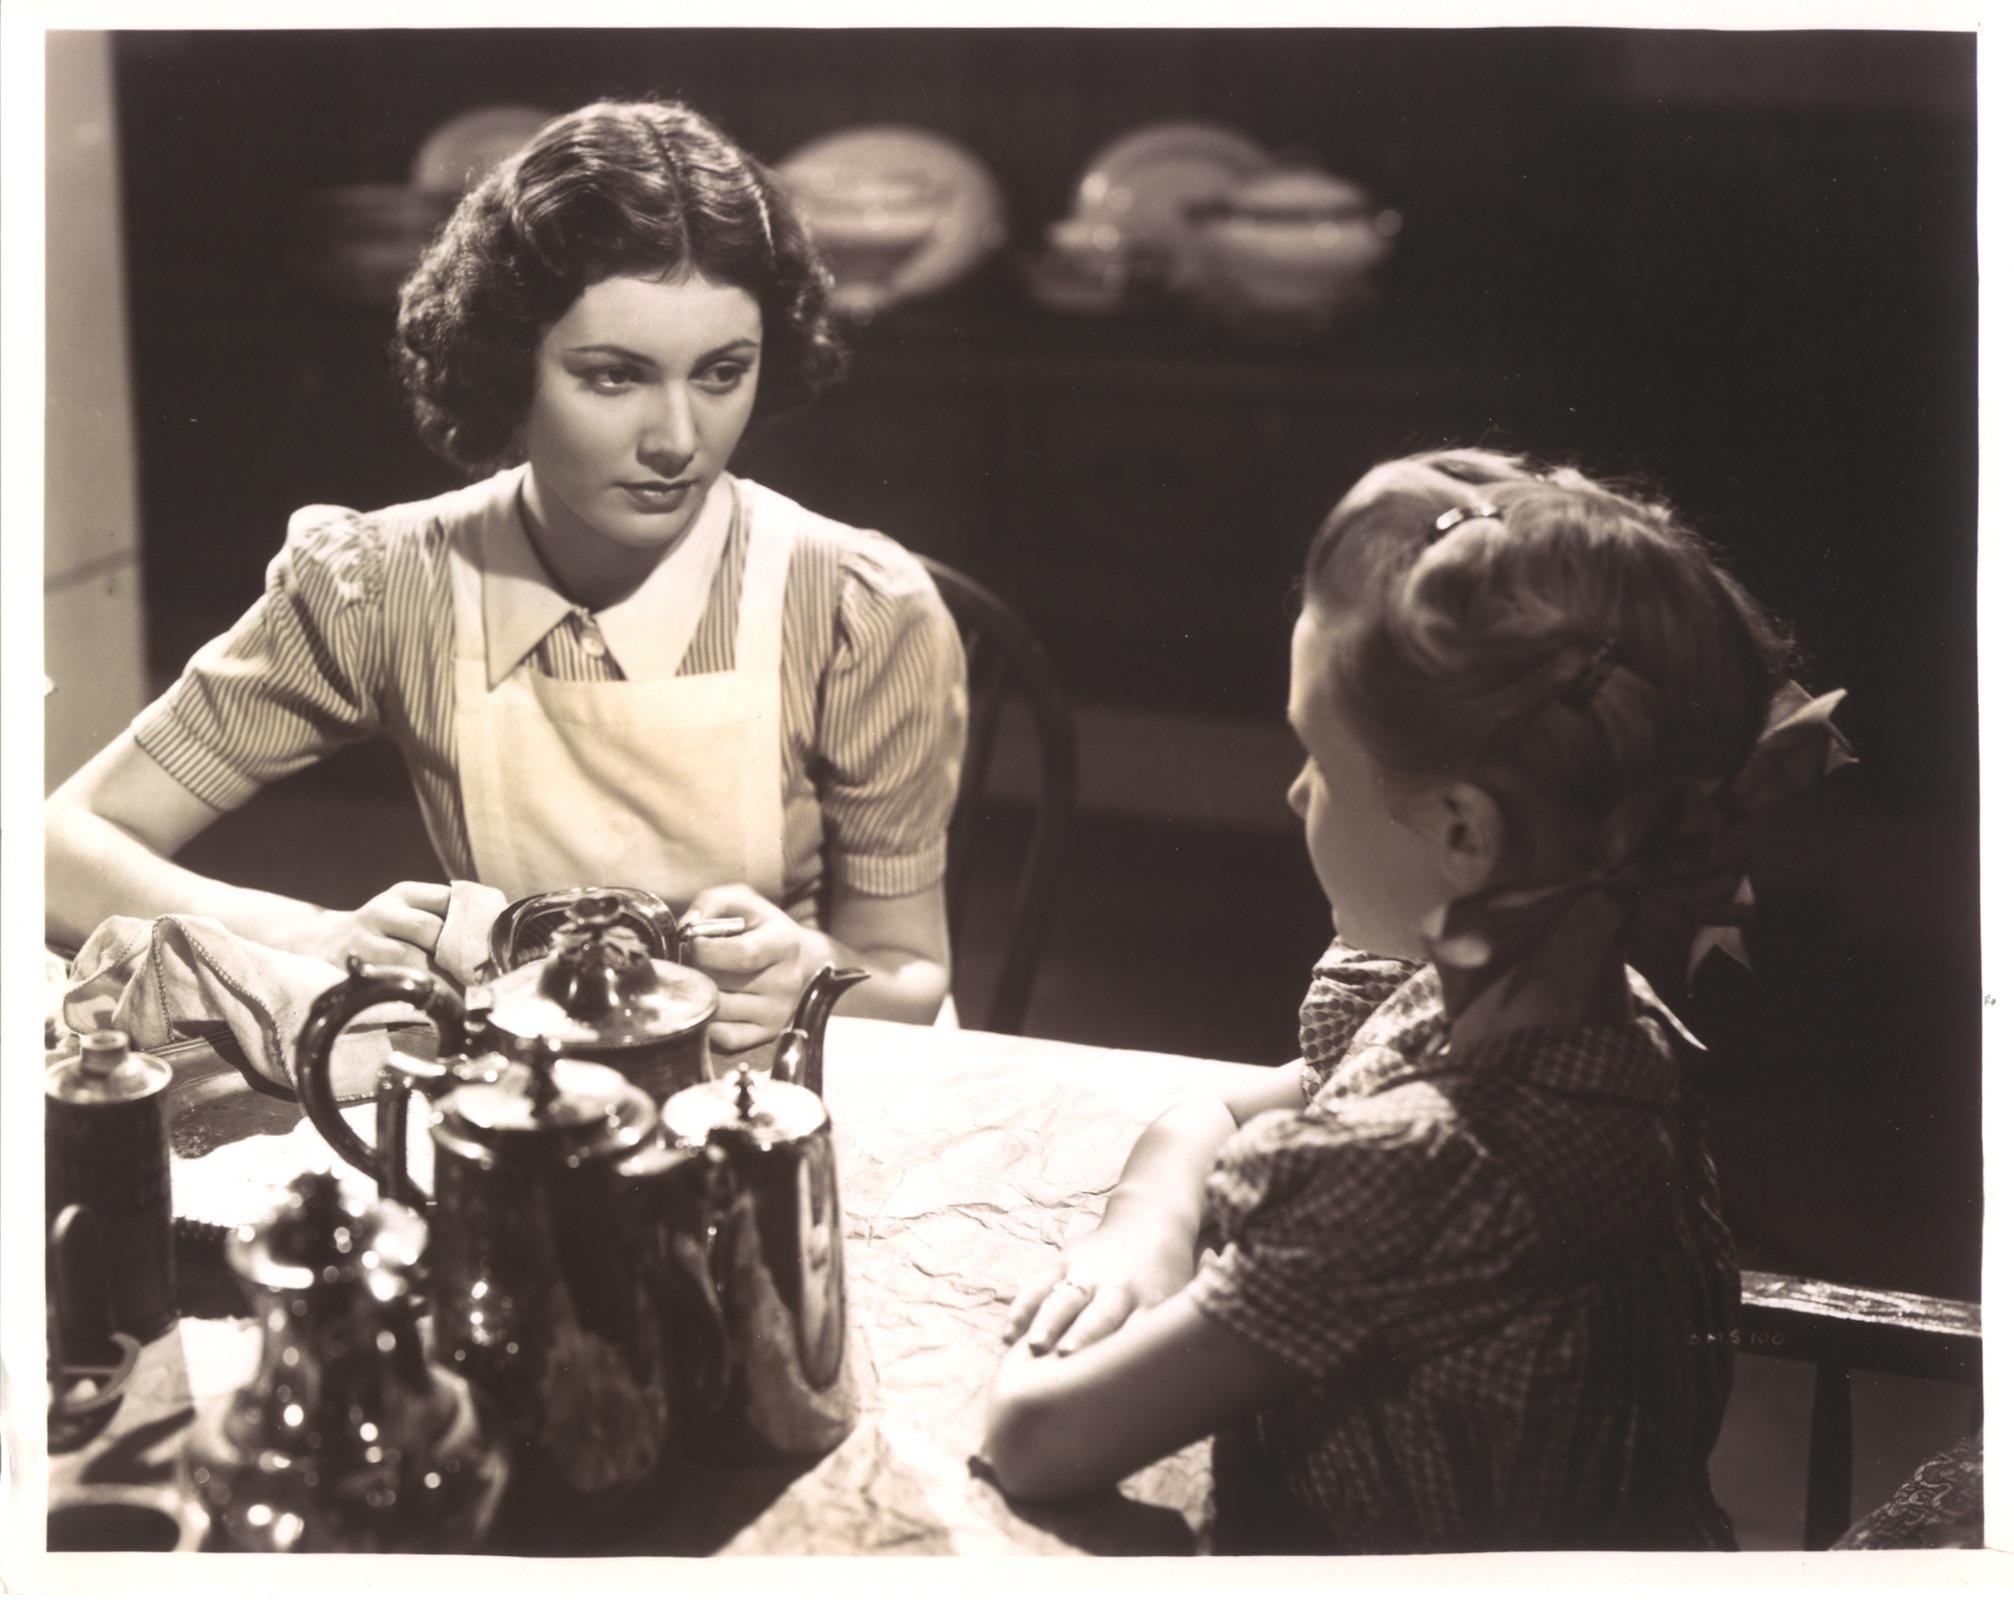 Shannan Click,Charlie Chaplin (1889?977) Sex pics & movies Jenny Agutter (born 1952),Gail Patrick